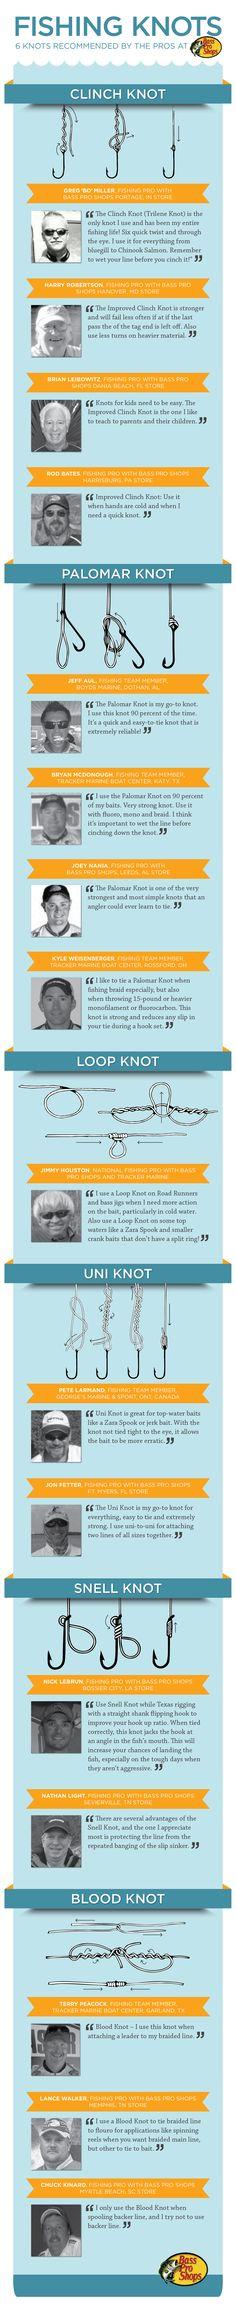 Best Fishing Knots - Bass Pro Shops